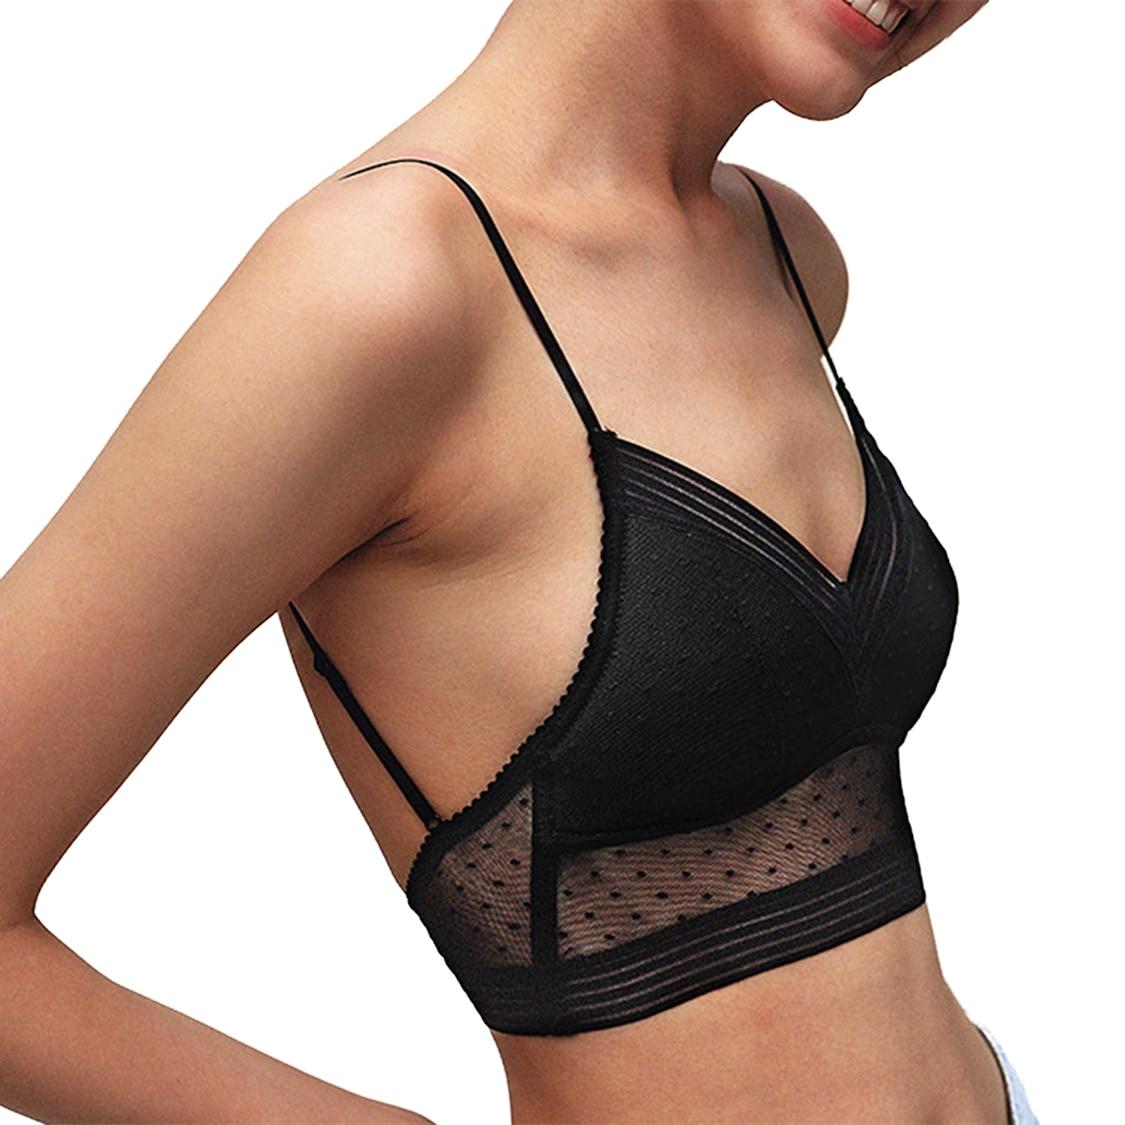 New Sexy Low Back Lace Bralette White Backless Bra dot mesh Ultra Thin Underwear Women Lingerie Sexy Tank Tops Bra